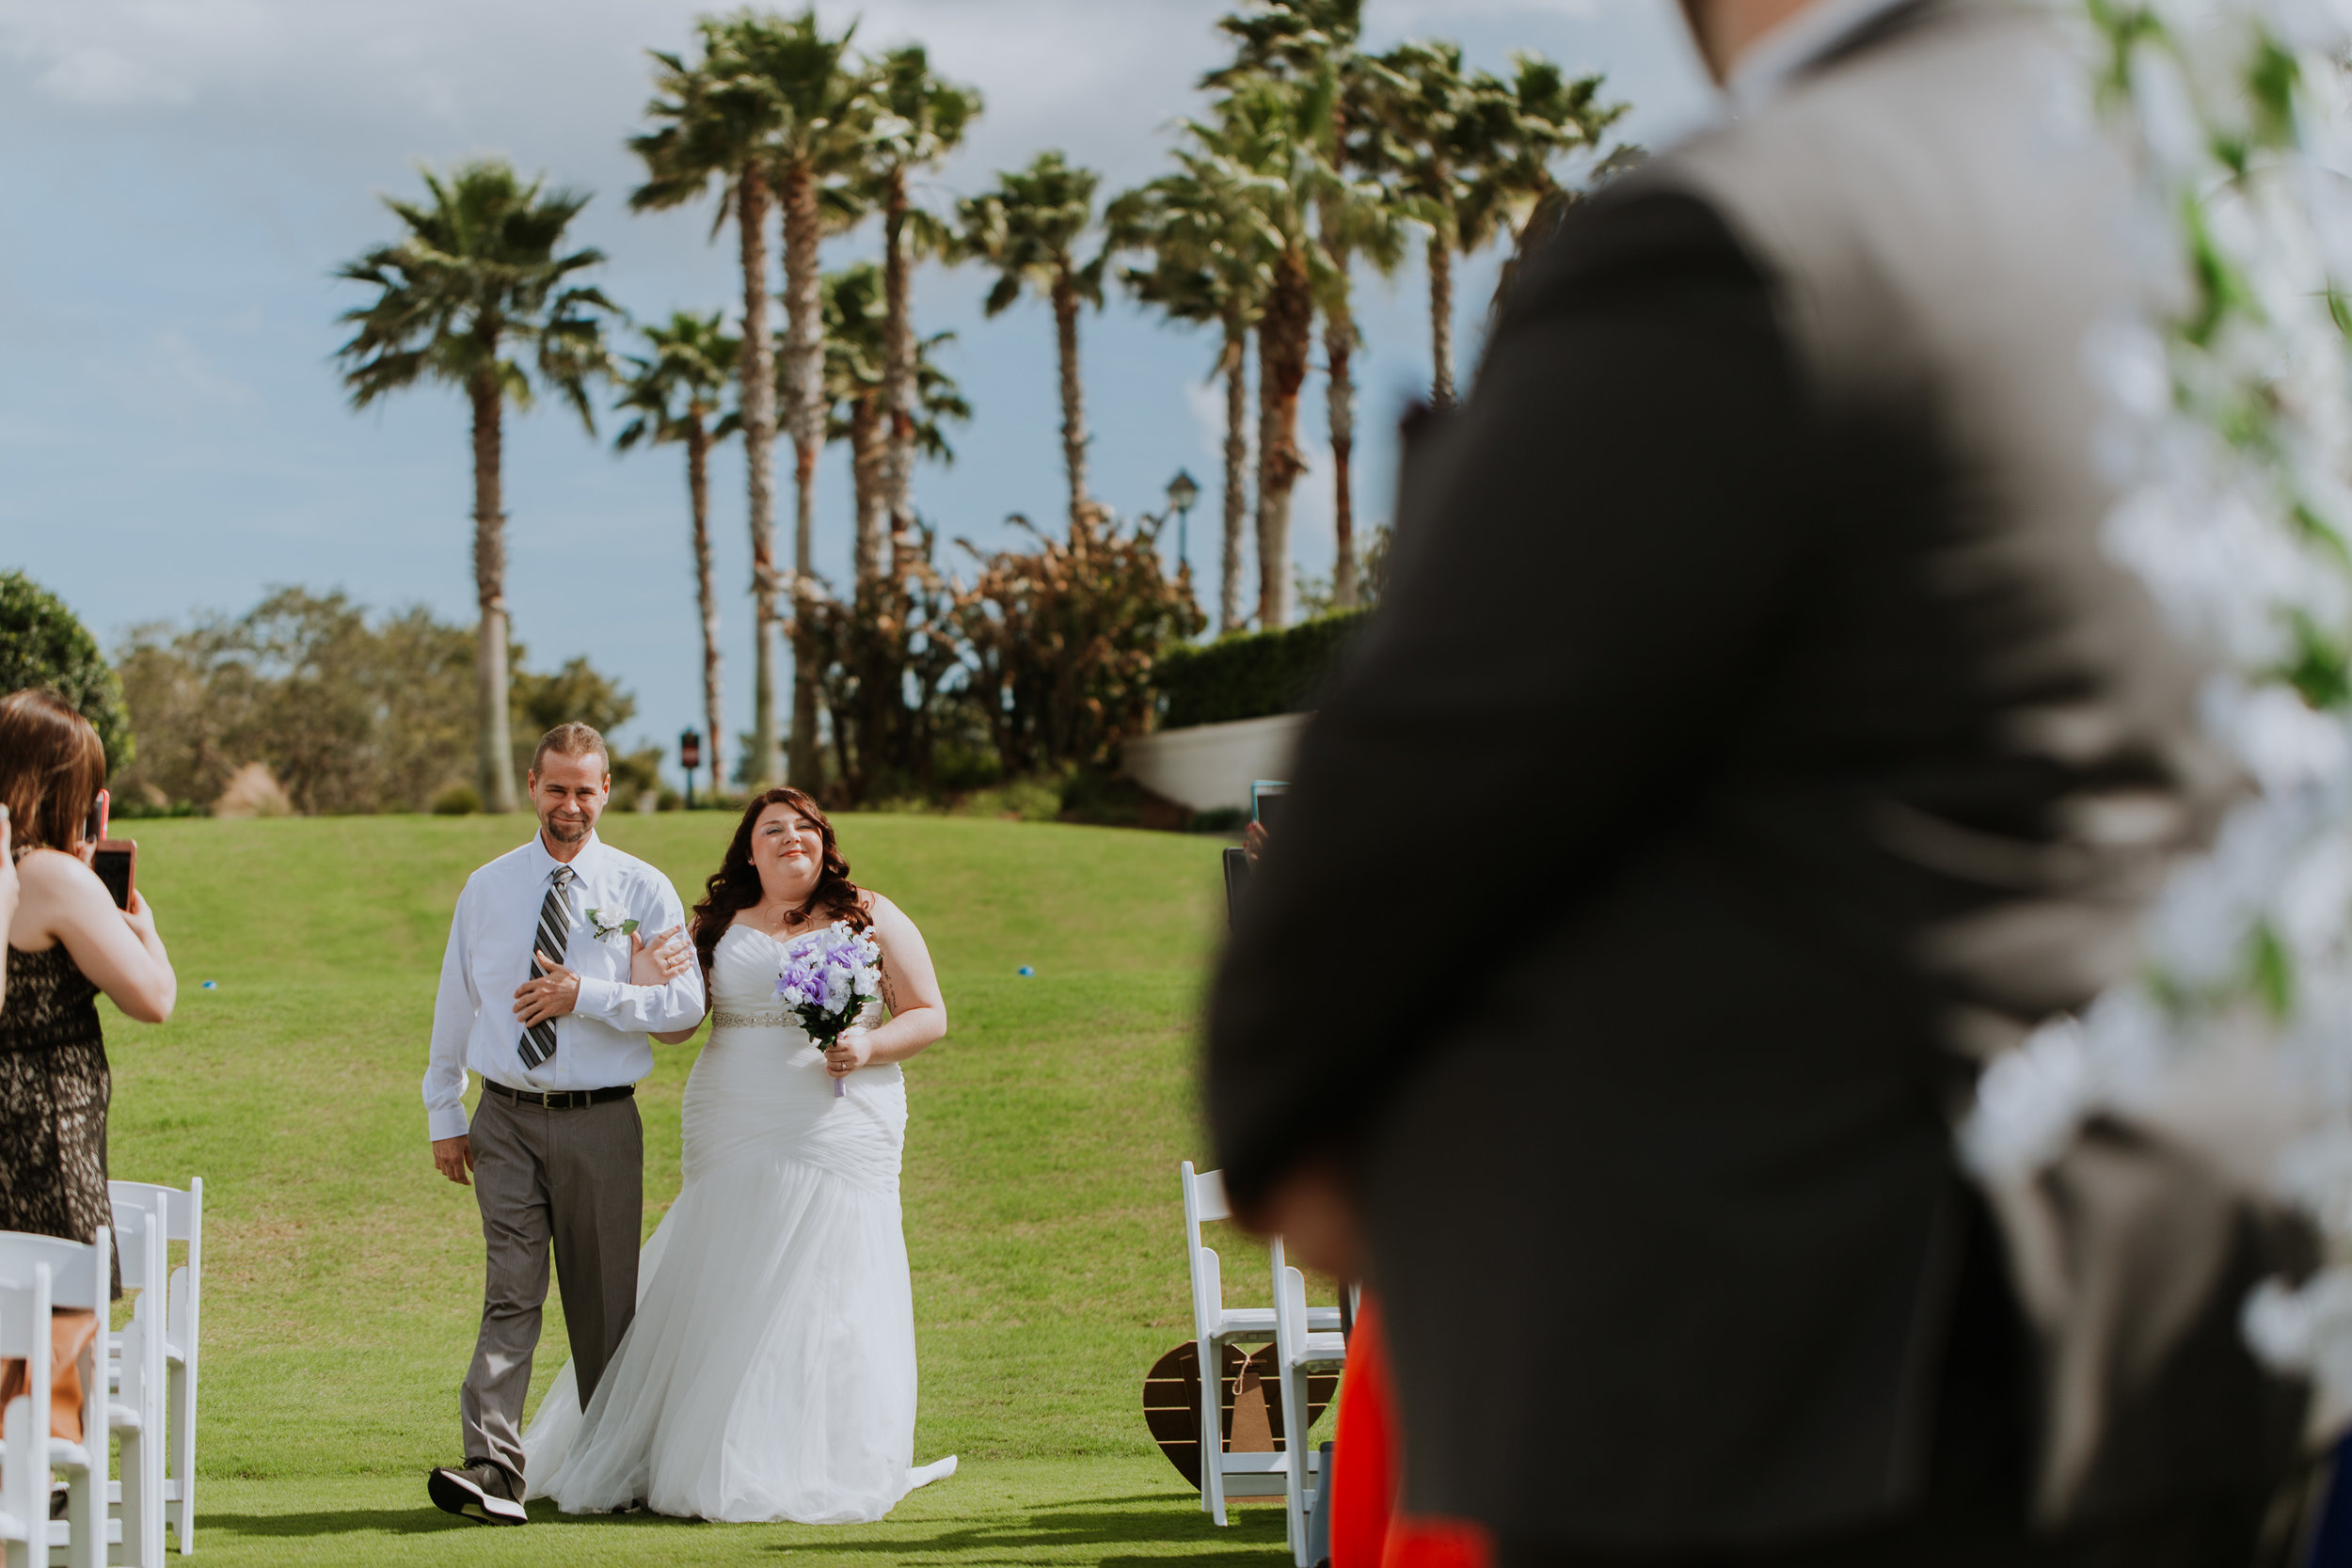 appolloni_new smyrna_wedding-173.jpg